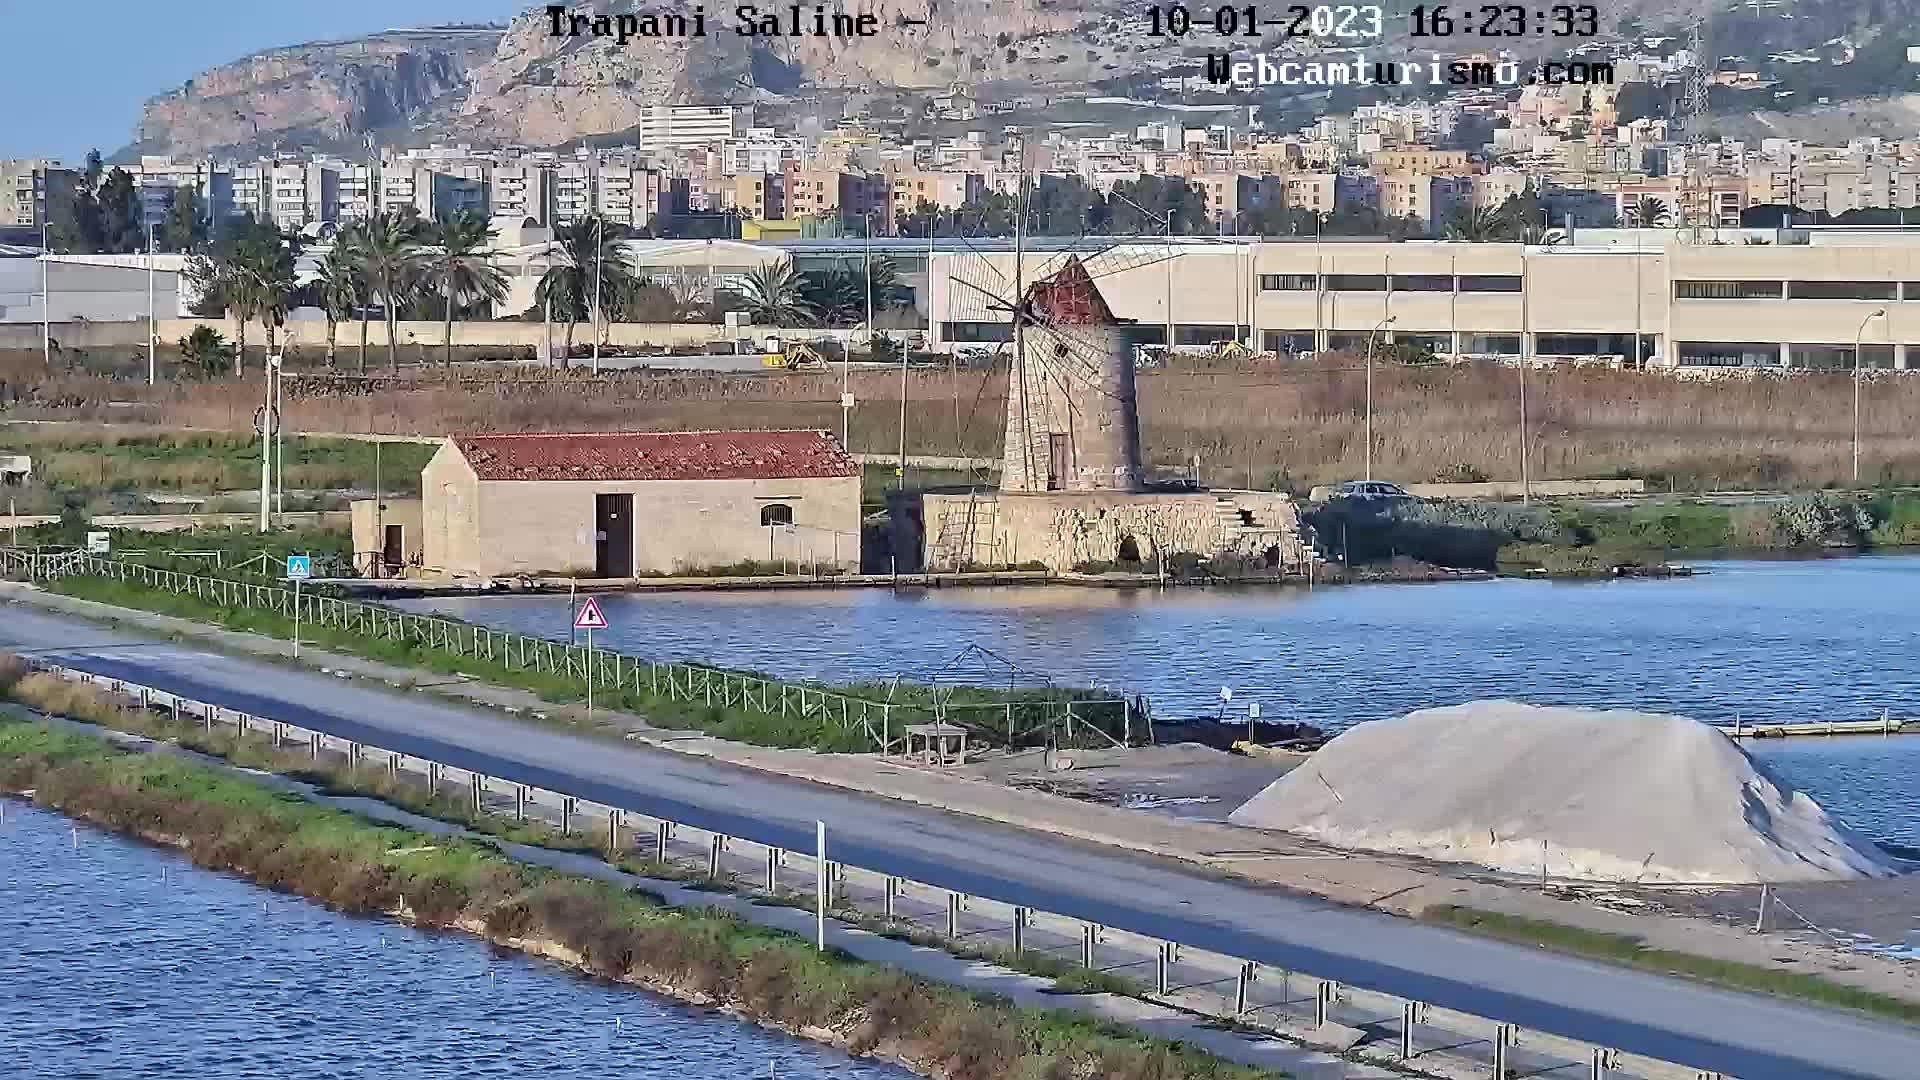 Webcam Trapani, Saline - Webcam Turismo